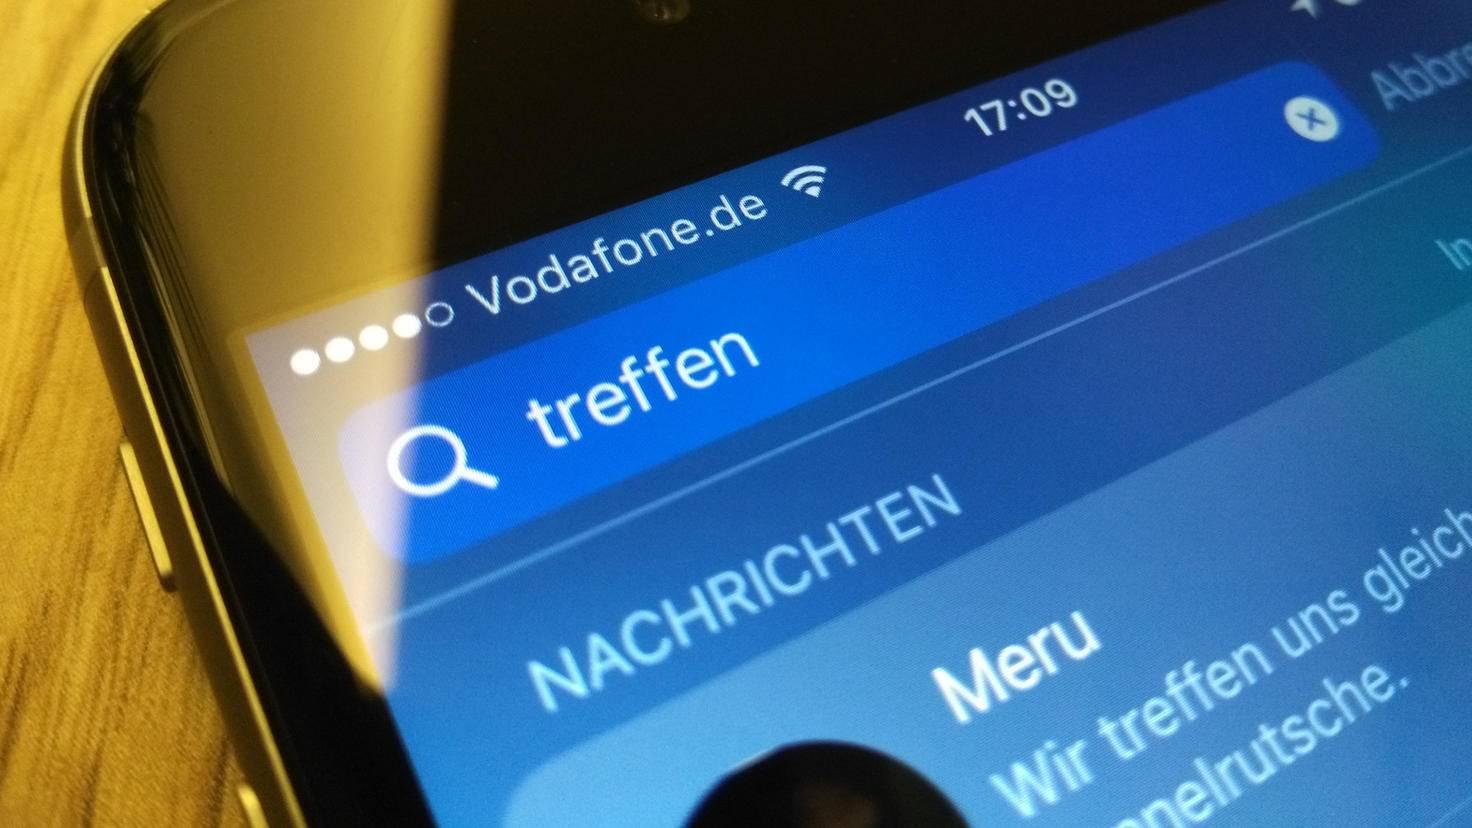 iPhone Spotlight Nachrichten